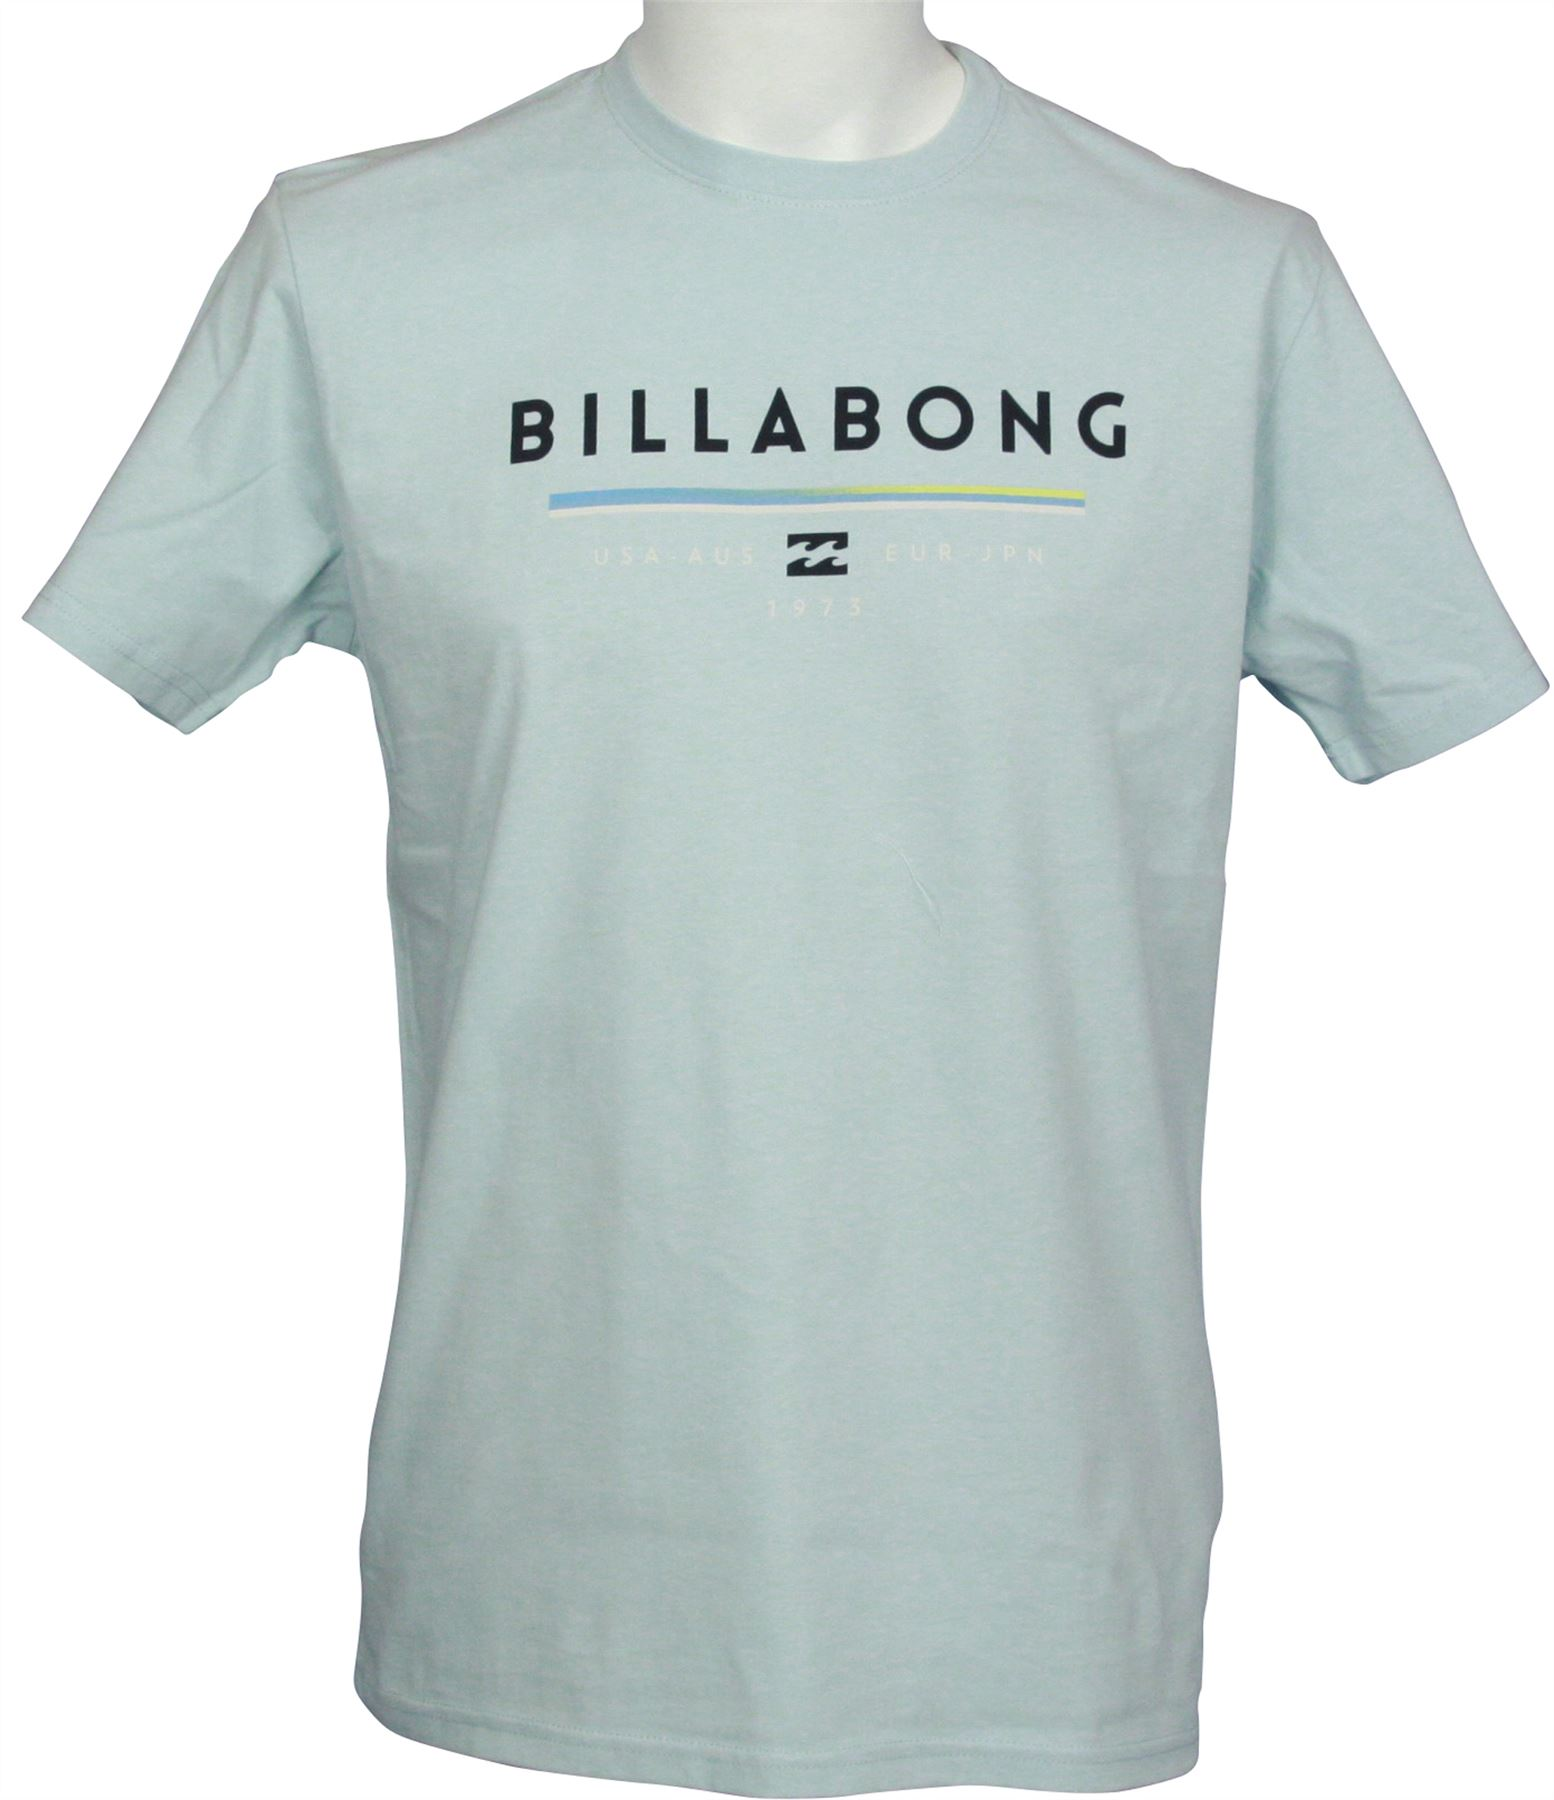 b4a714a8 Billabong Men's T-Shirt ~ Unity sky blue | eBay